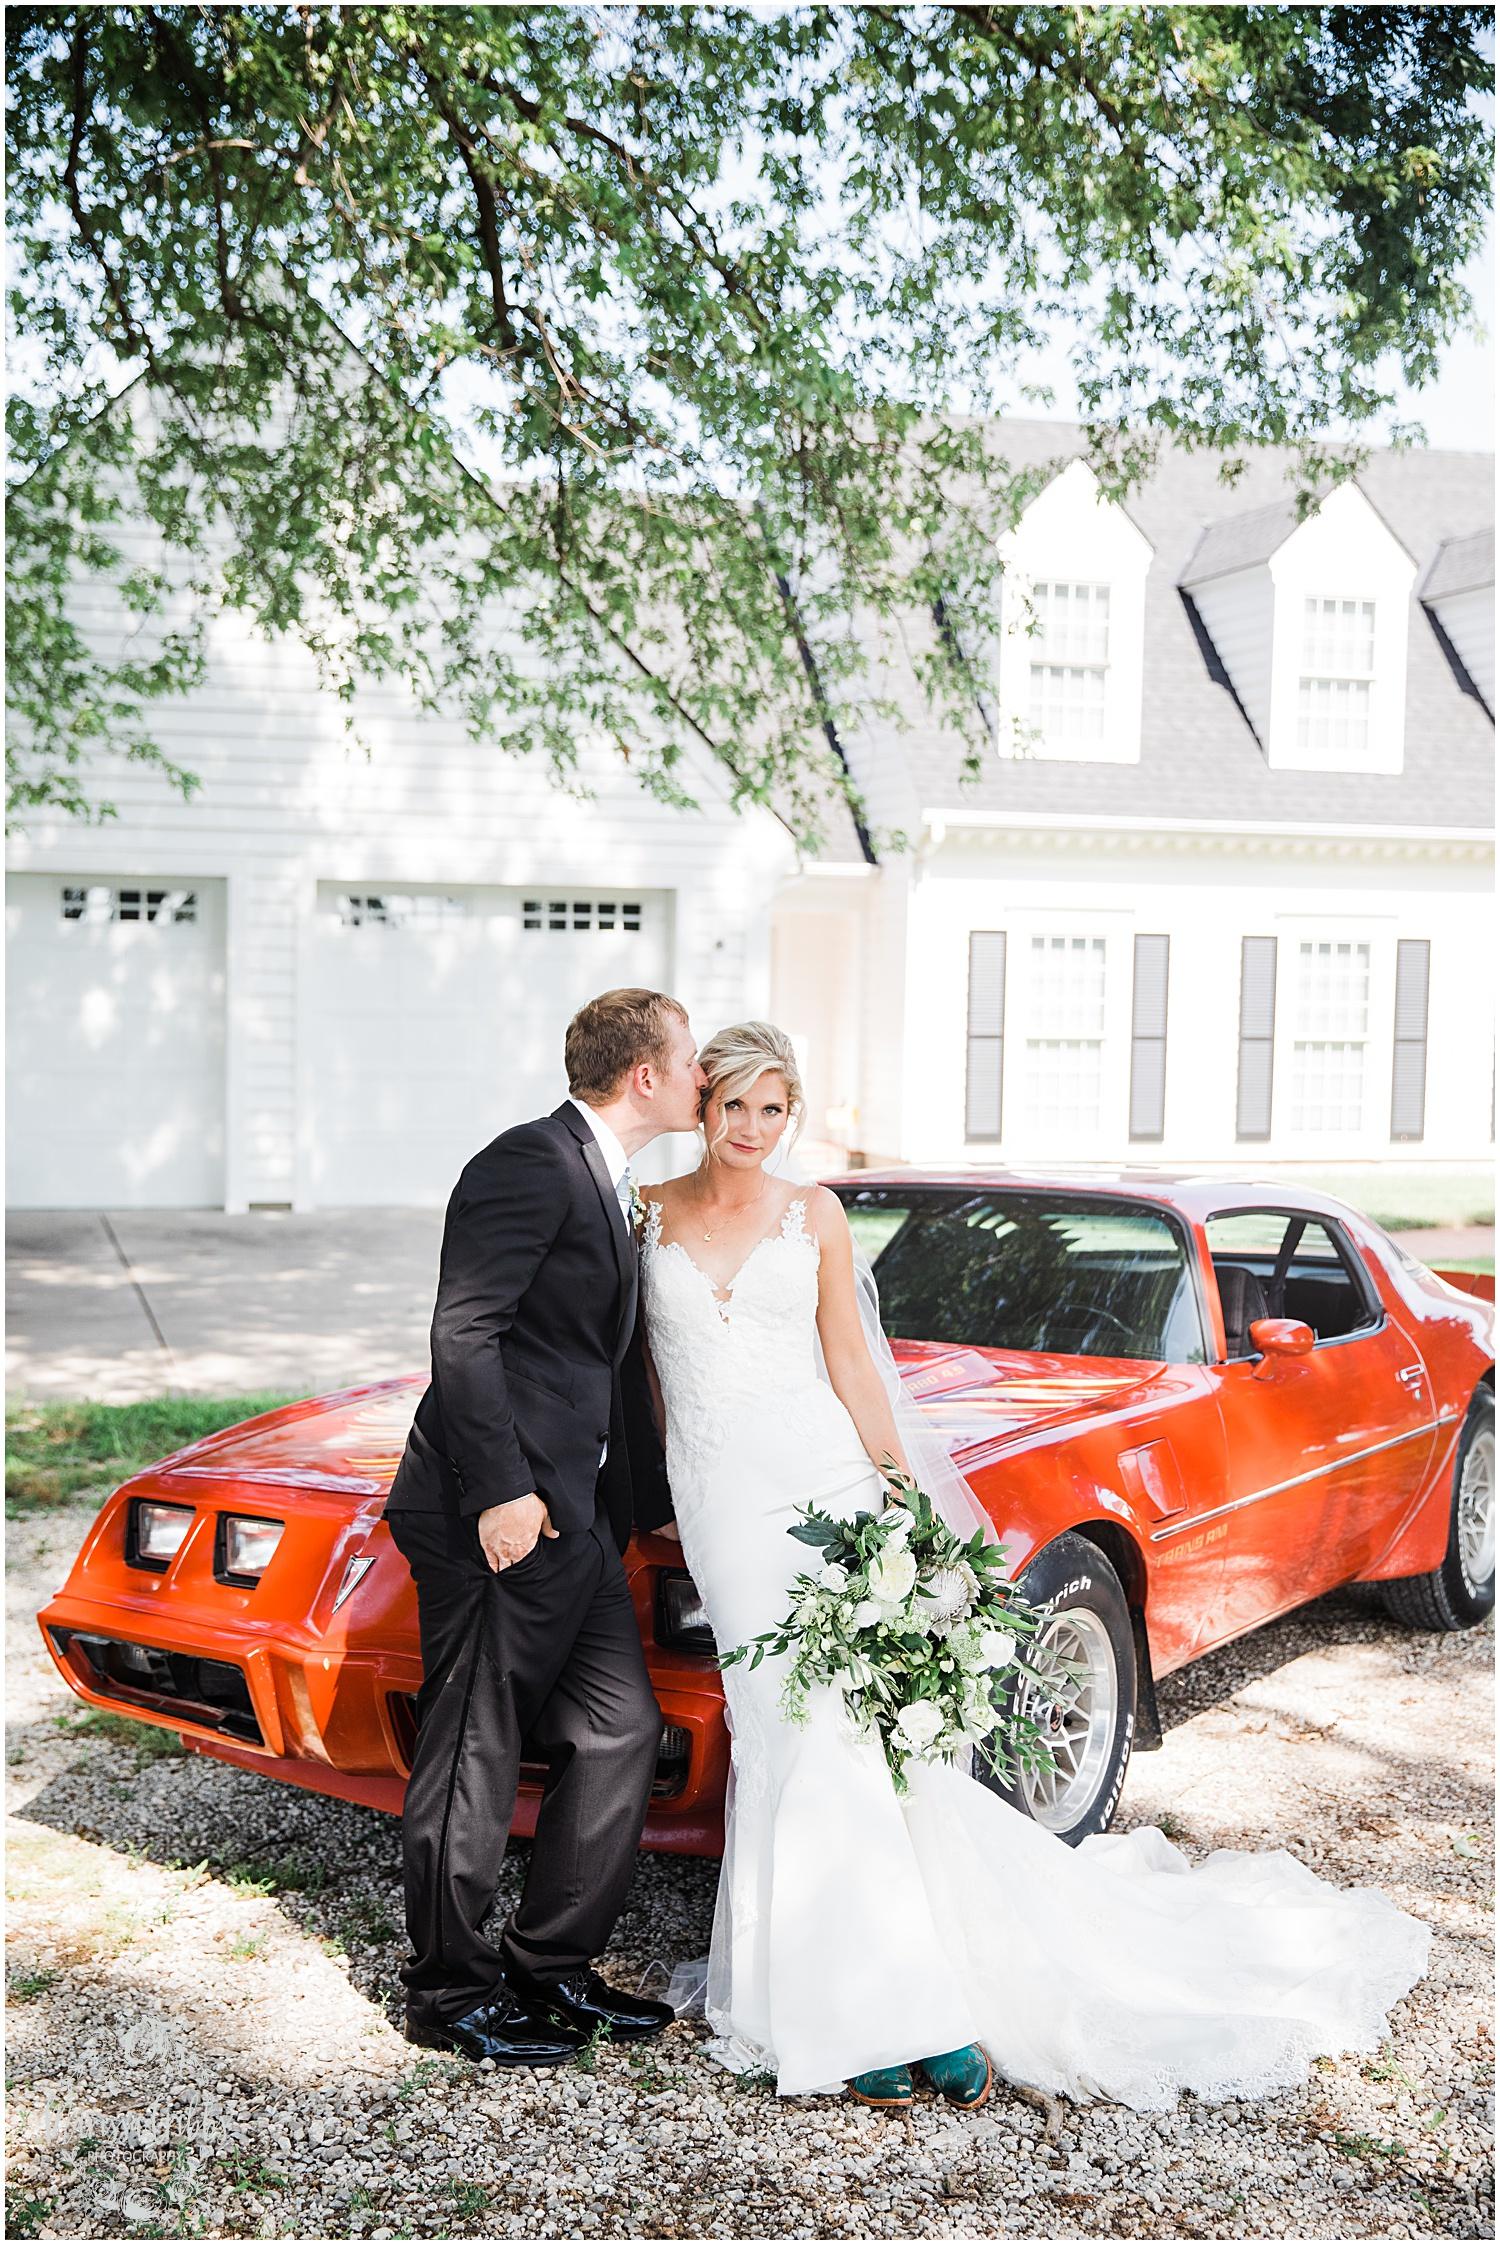 CHELSEA & BEN MARRIED BLOG  | MARISSA CRIBBS PHOTOGRAPHY_8582.jpg